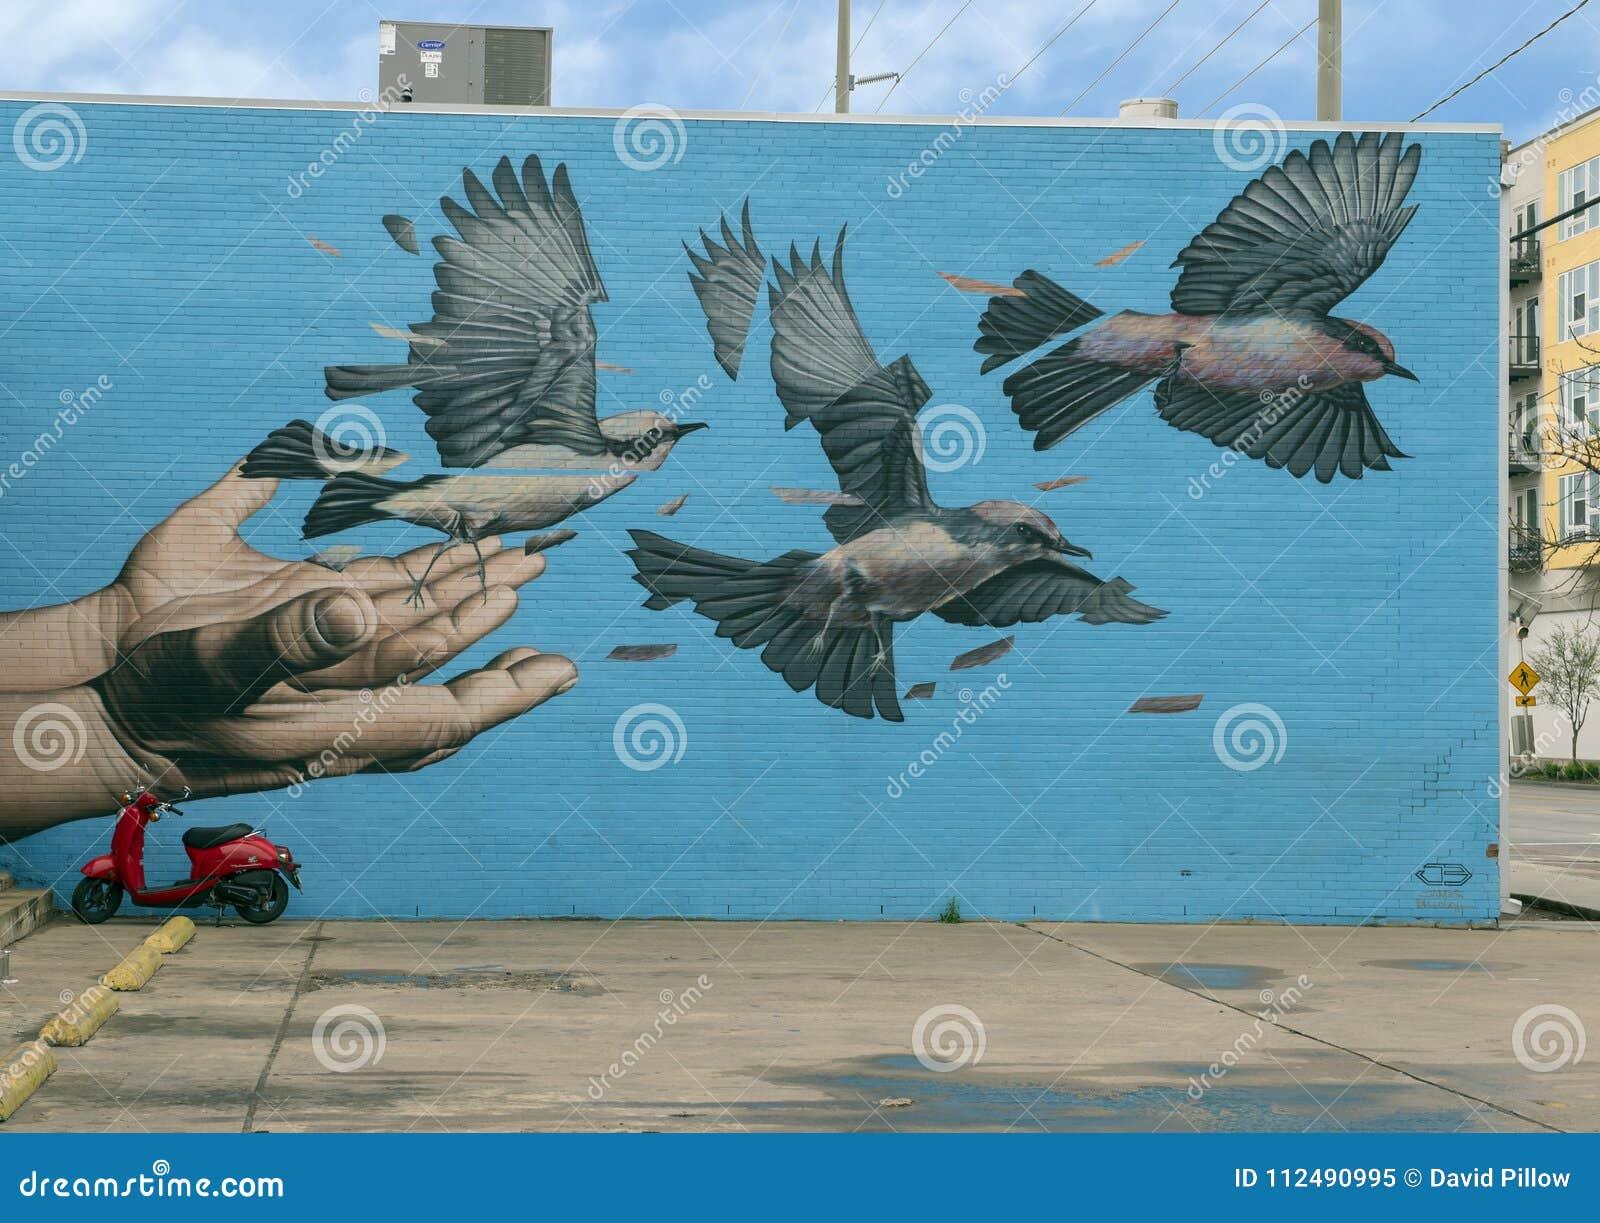 Настенная роспись рощами троицы Джеймс Bullough, Даллас, Техас